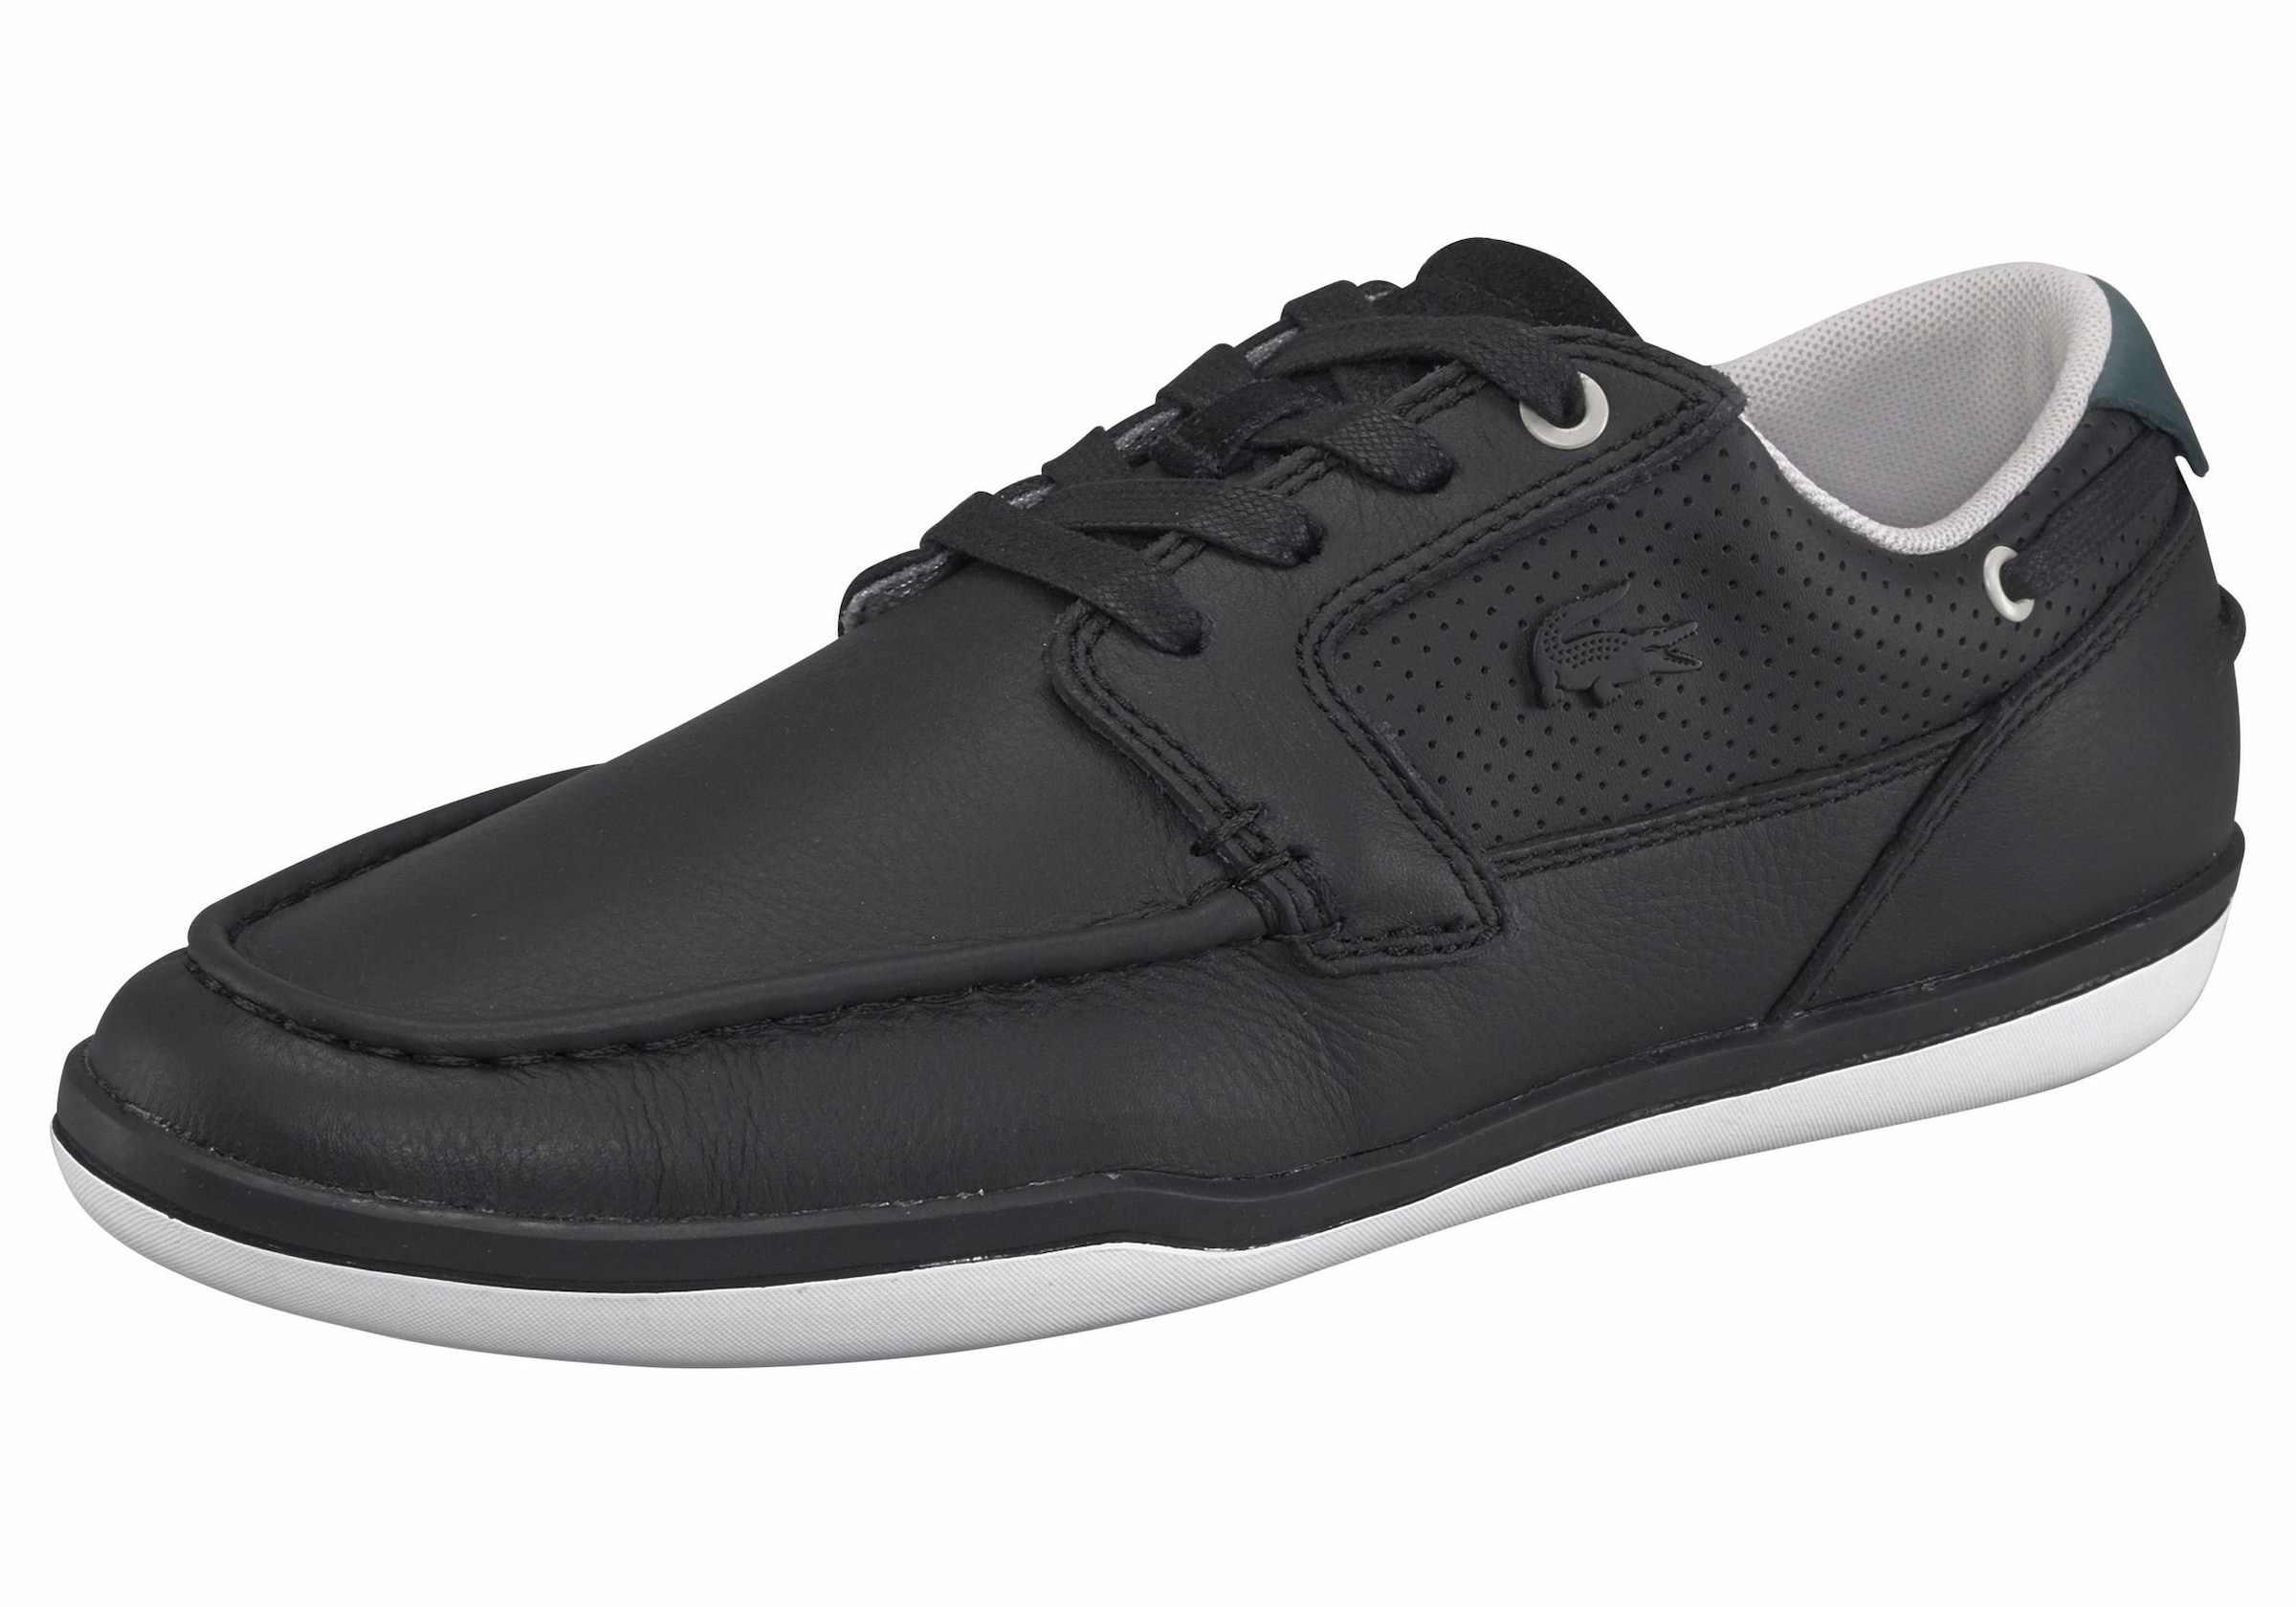 LACOSTE Sneaker Deck-Minimal 317 1 Hohe Qualität